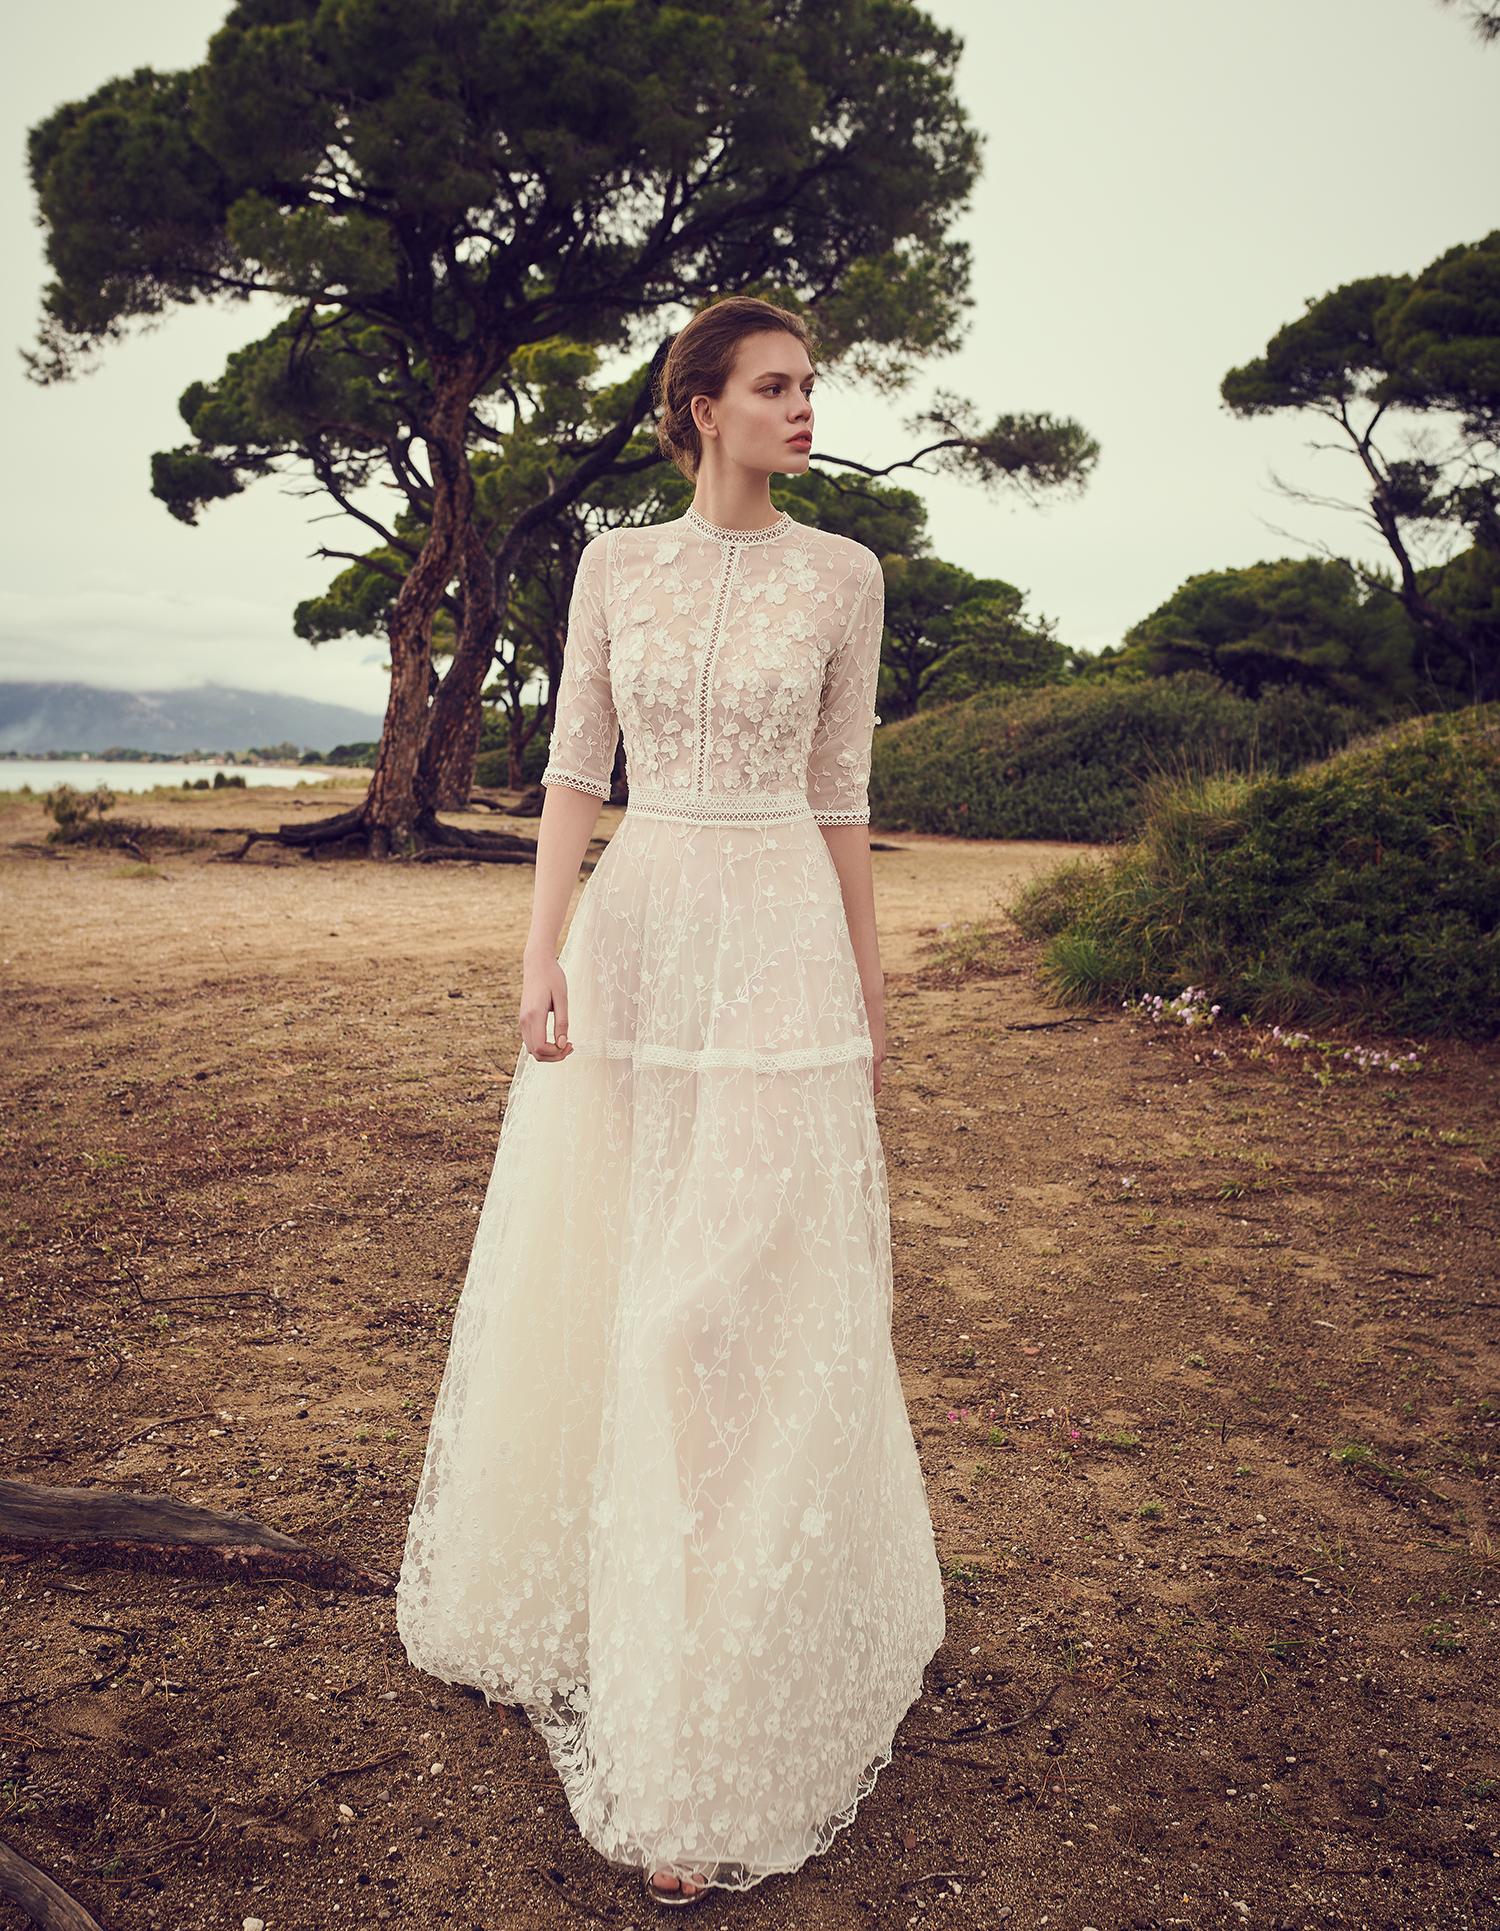 costarellos quarter length sleeves lace overlay wedding dress spring 2020